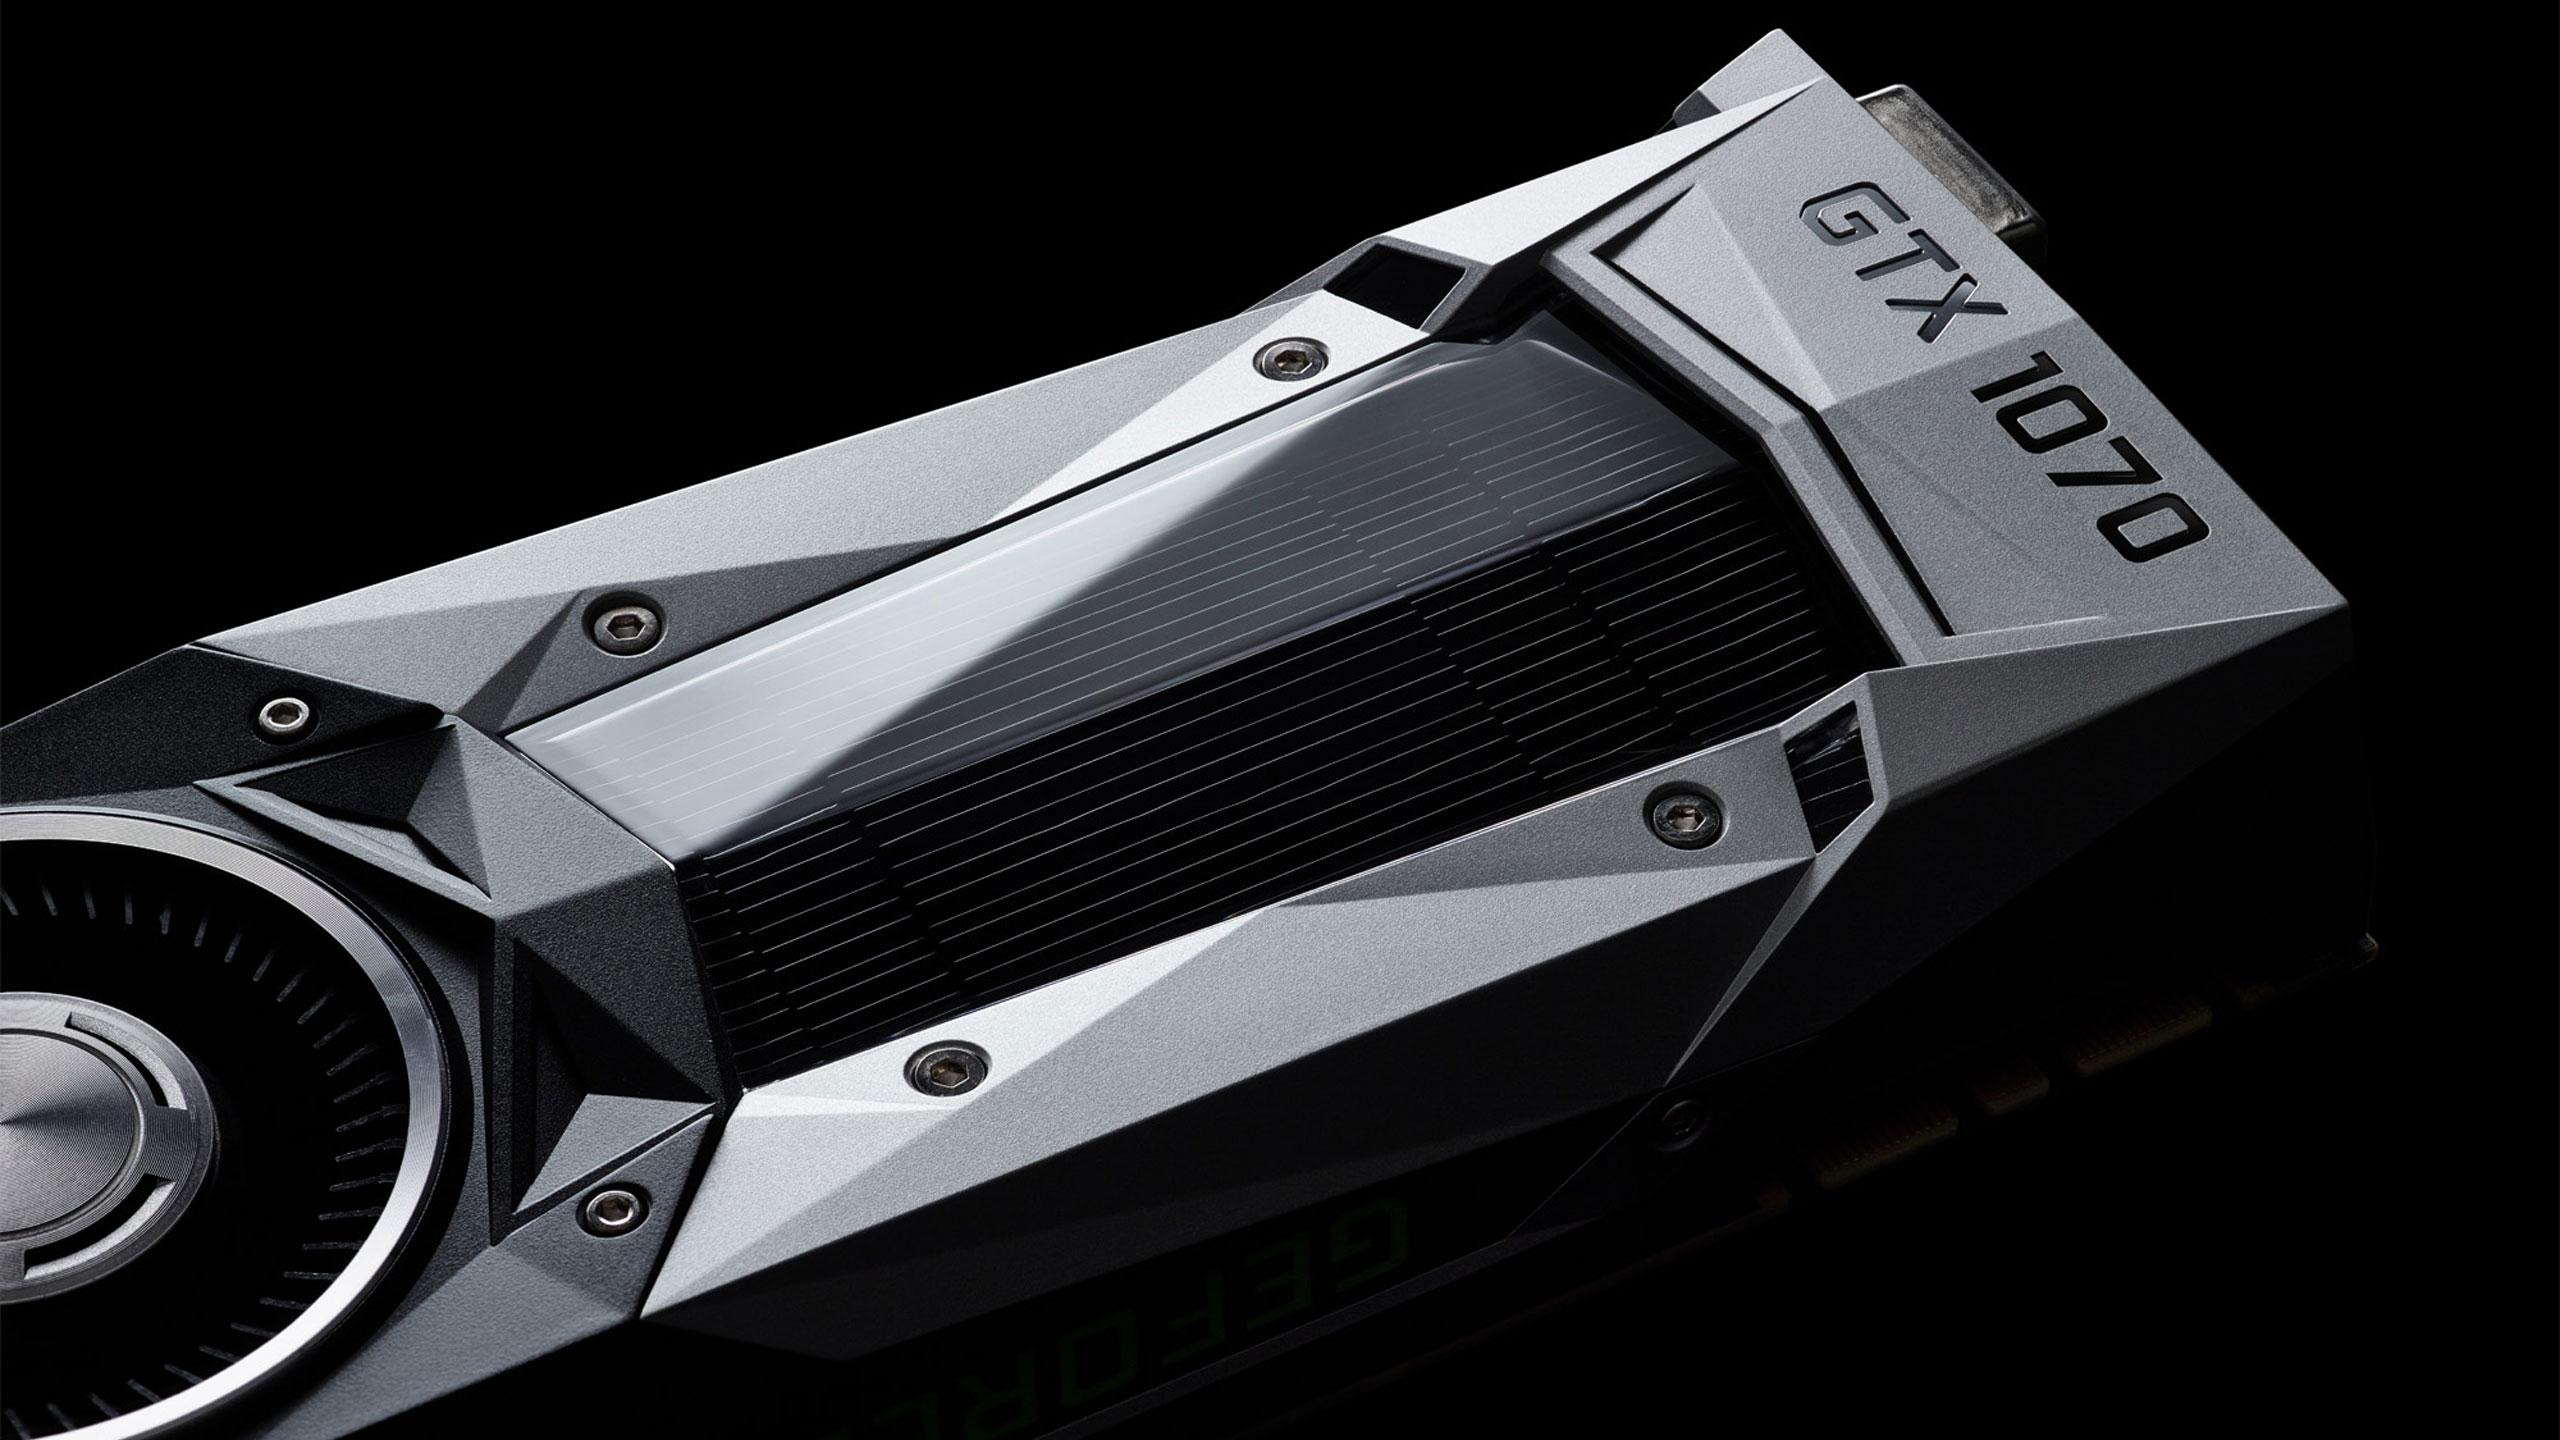 Best Nvidia GeForce GTX 1070 deals for 2019 | PC Gamer